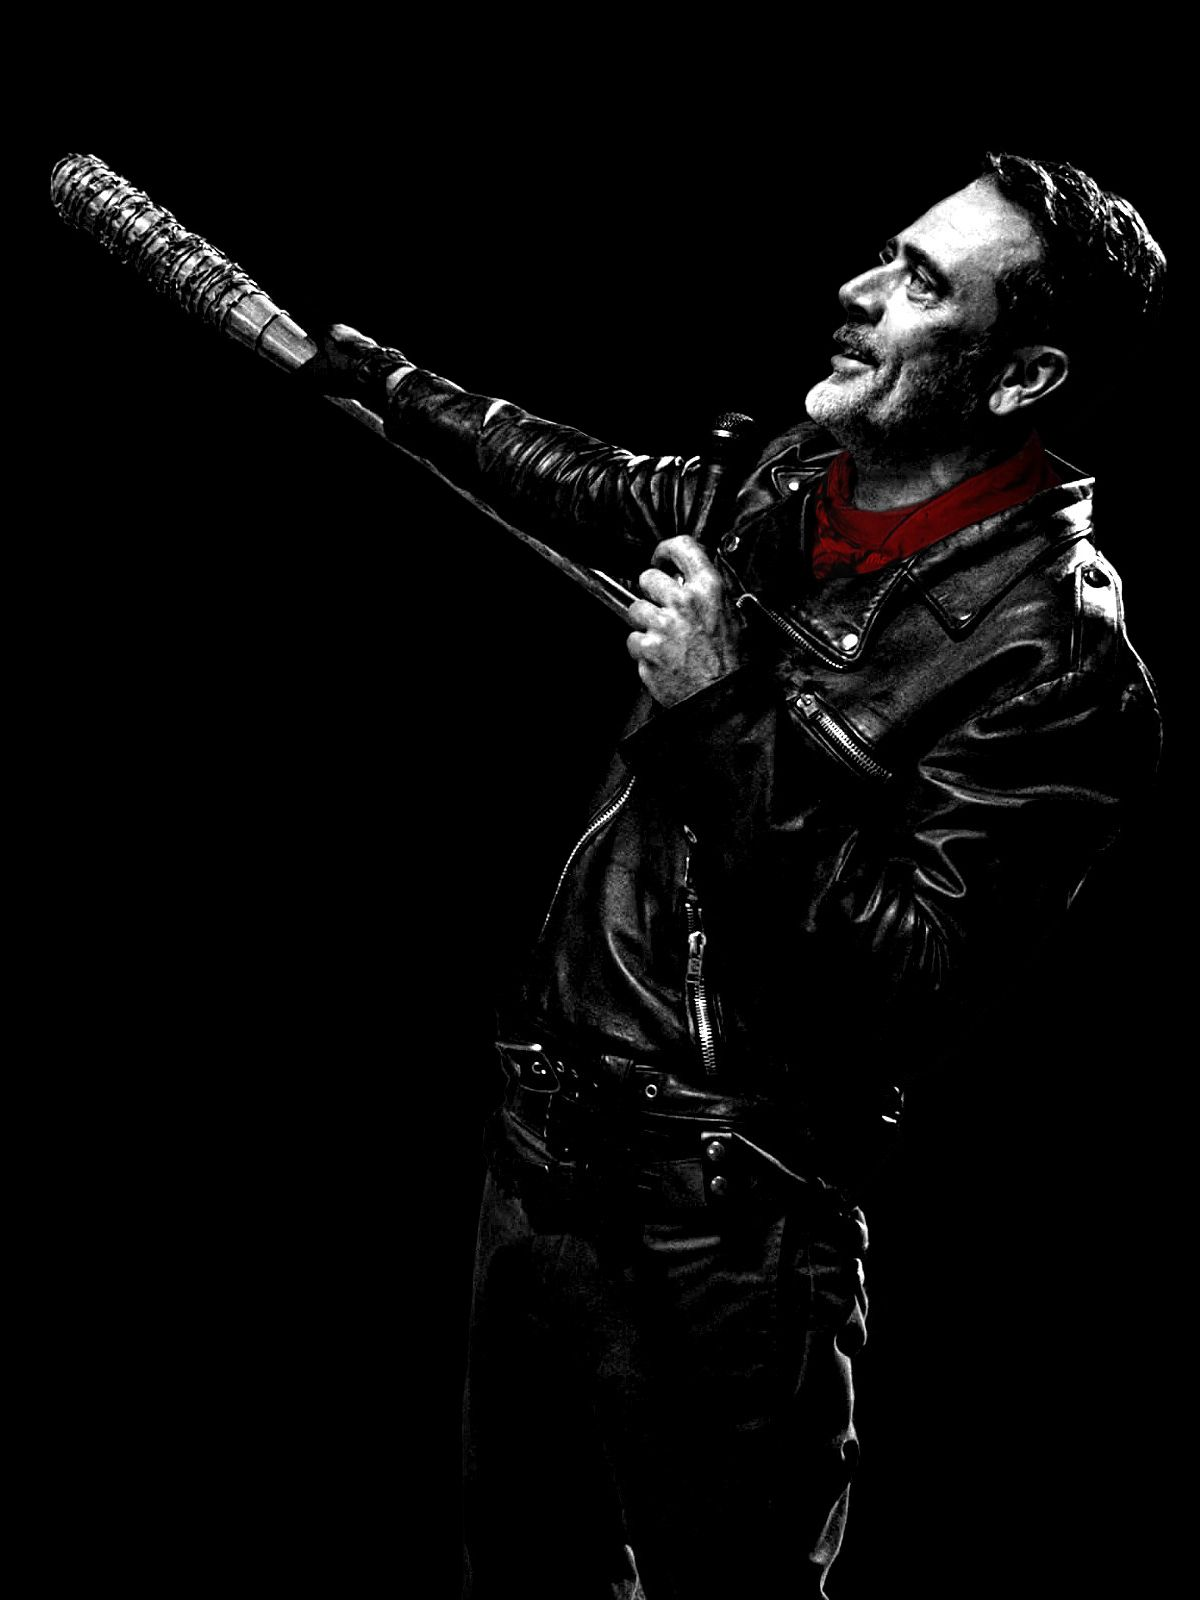 WALKING DEAD POSTER Negan Baseball Bat Fear Zombie Season Photo Poster A3 A4